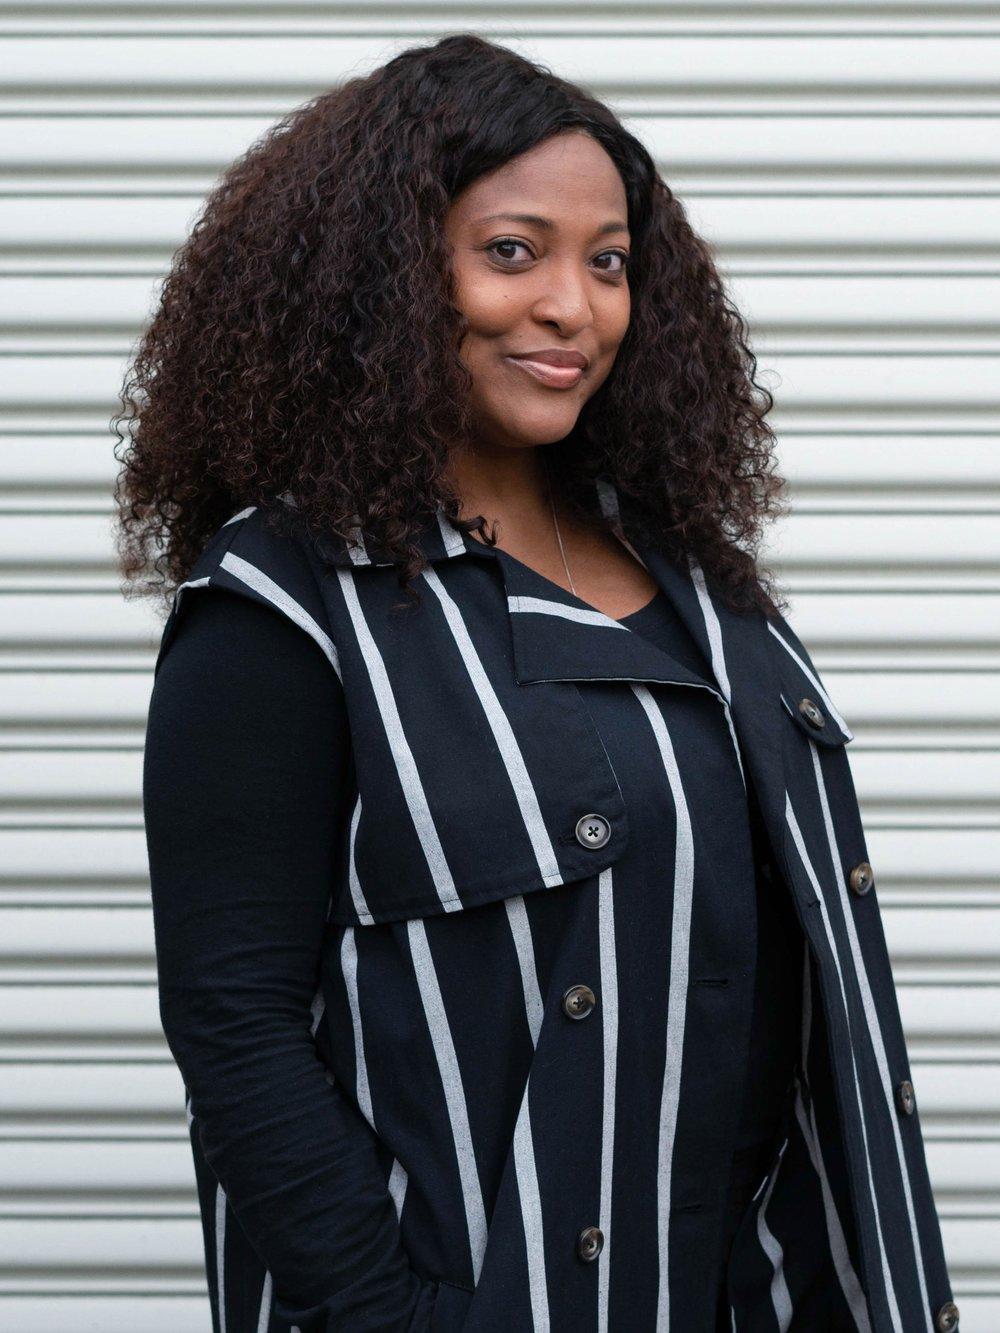 AISHA BEAN - Director, People & CultureAbout Aisha